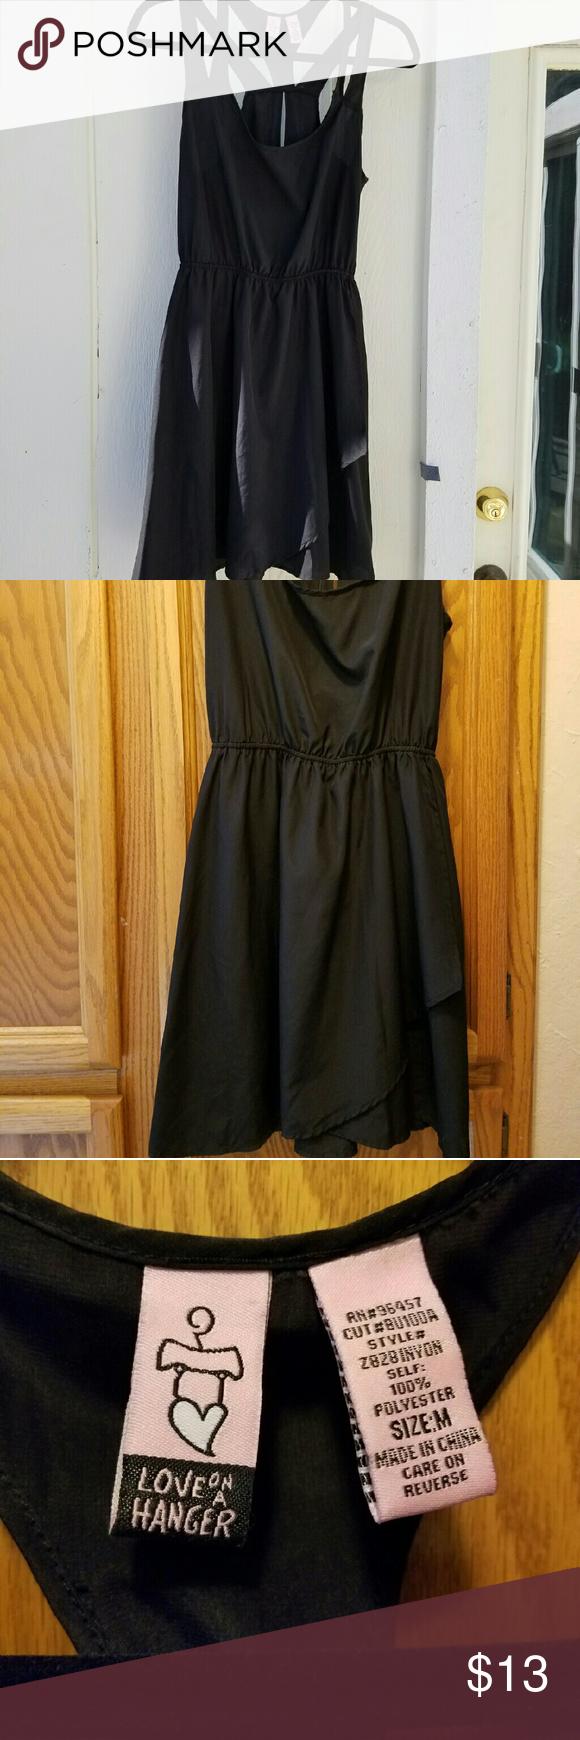 Dress medium Black dress.  Very flattering.  Worn once Dresses Midi